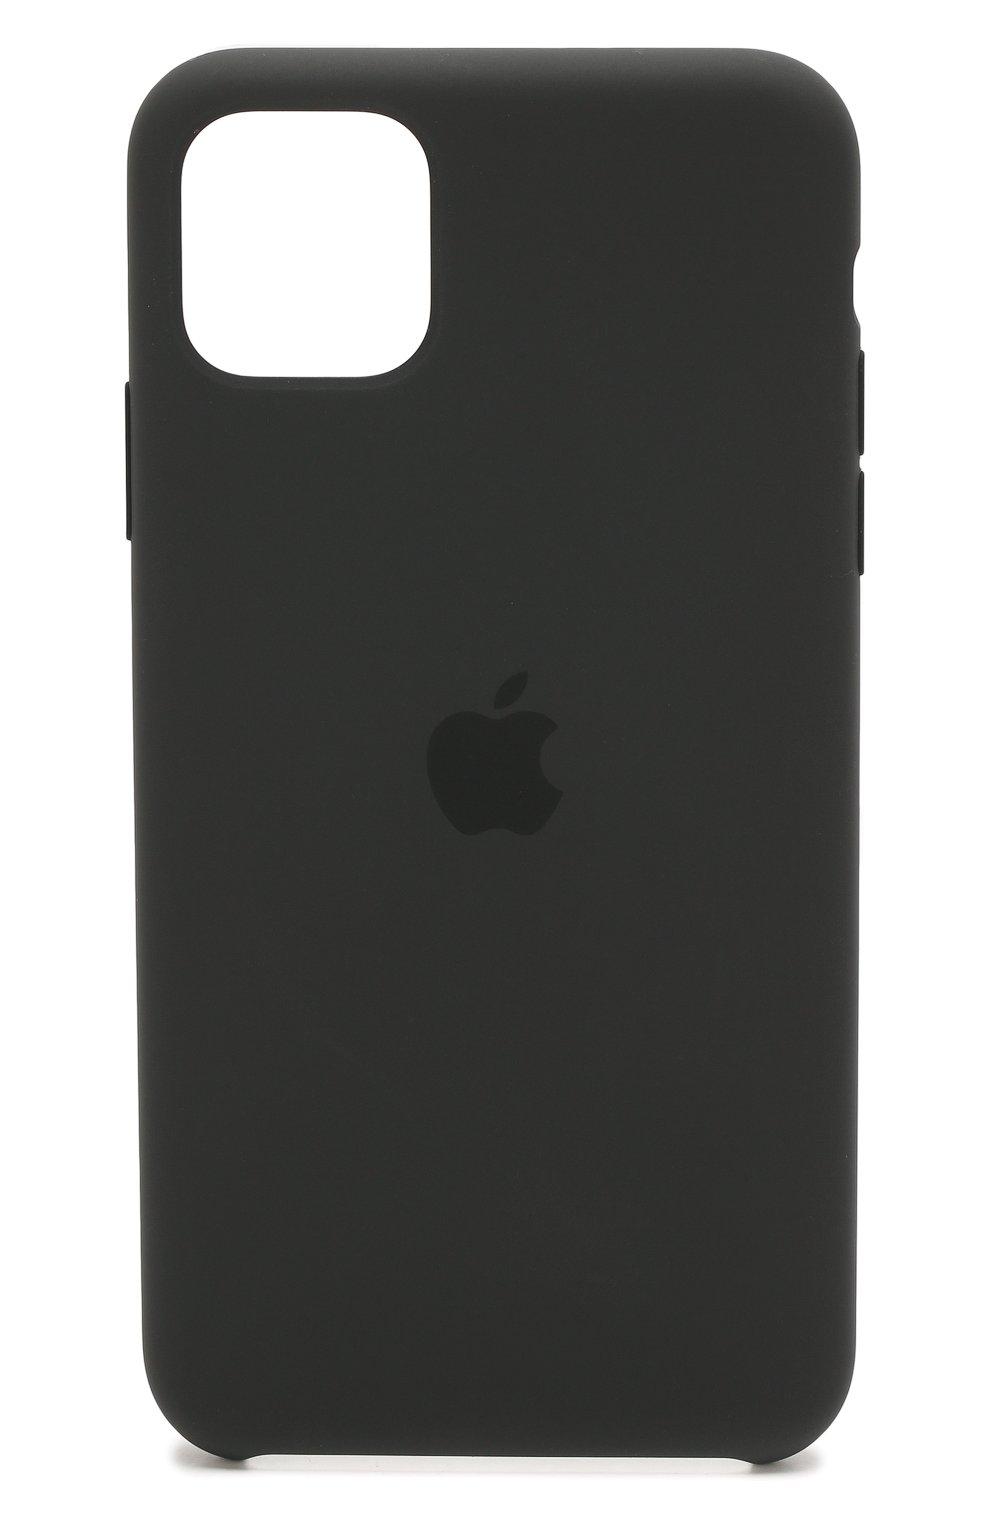 Чехол для iphone 11 pro max APPLE  черного цвета, арт. MX002ZM/A   Фото 1